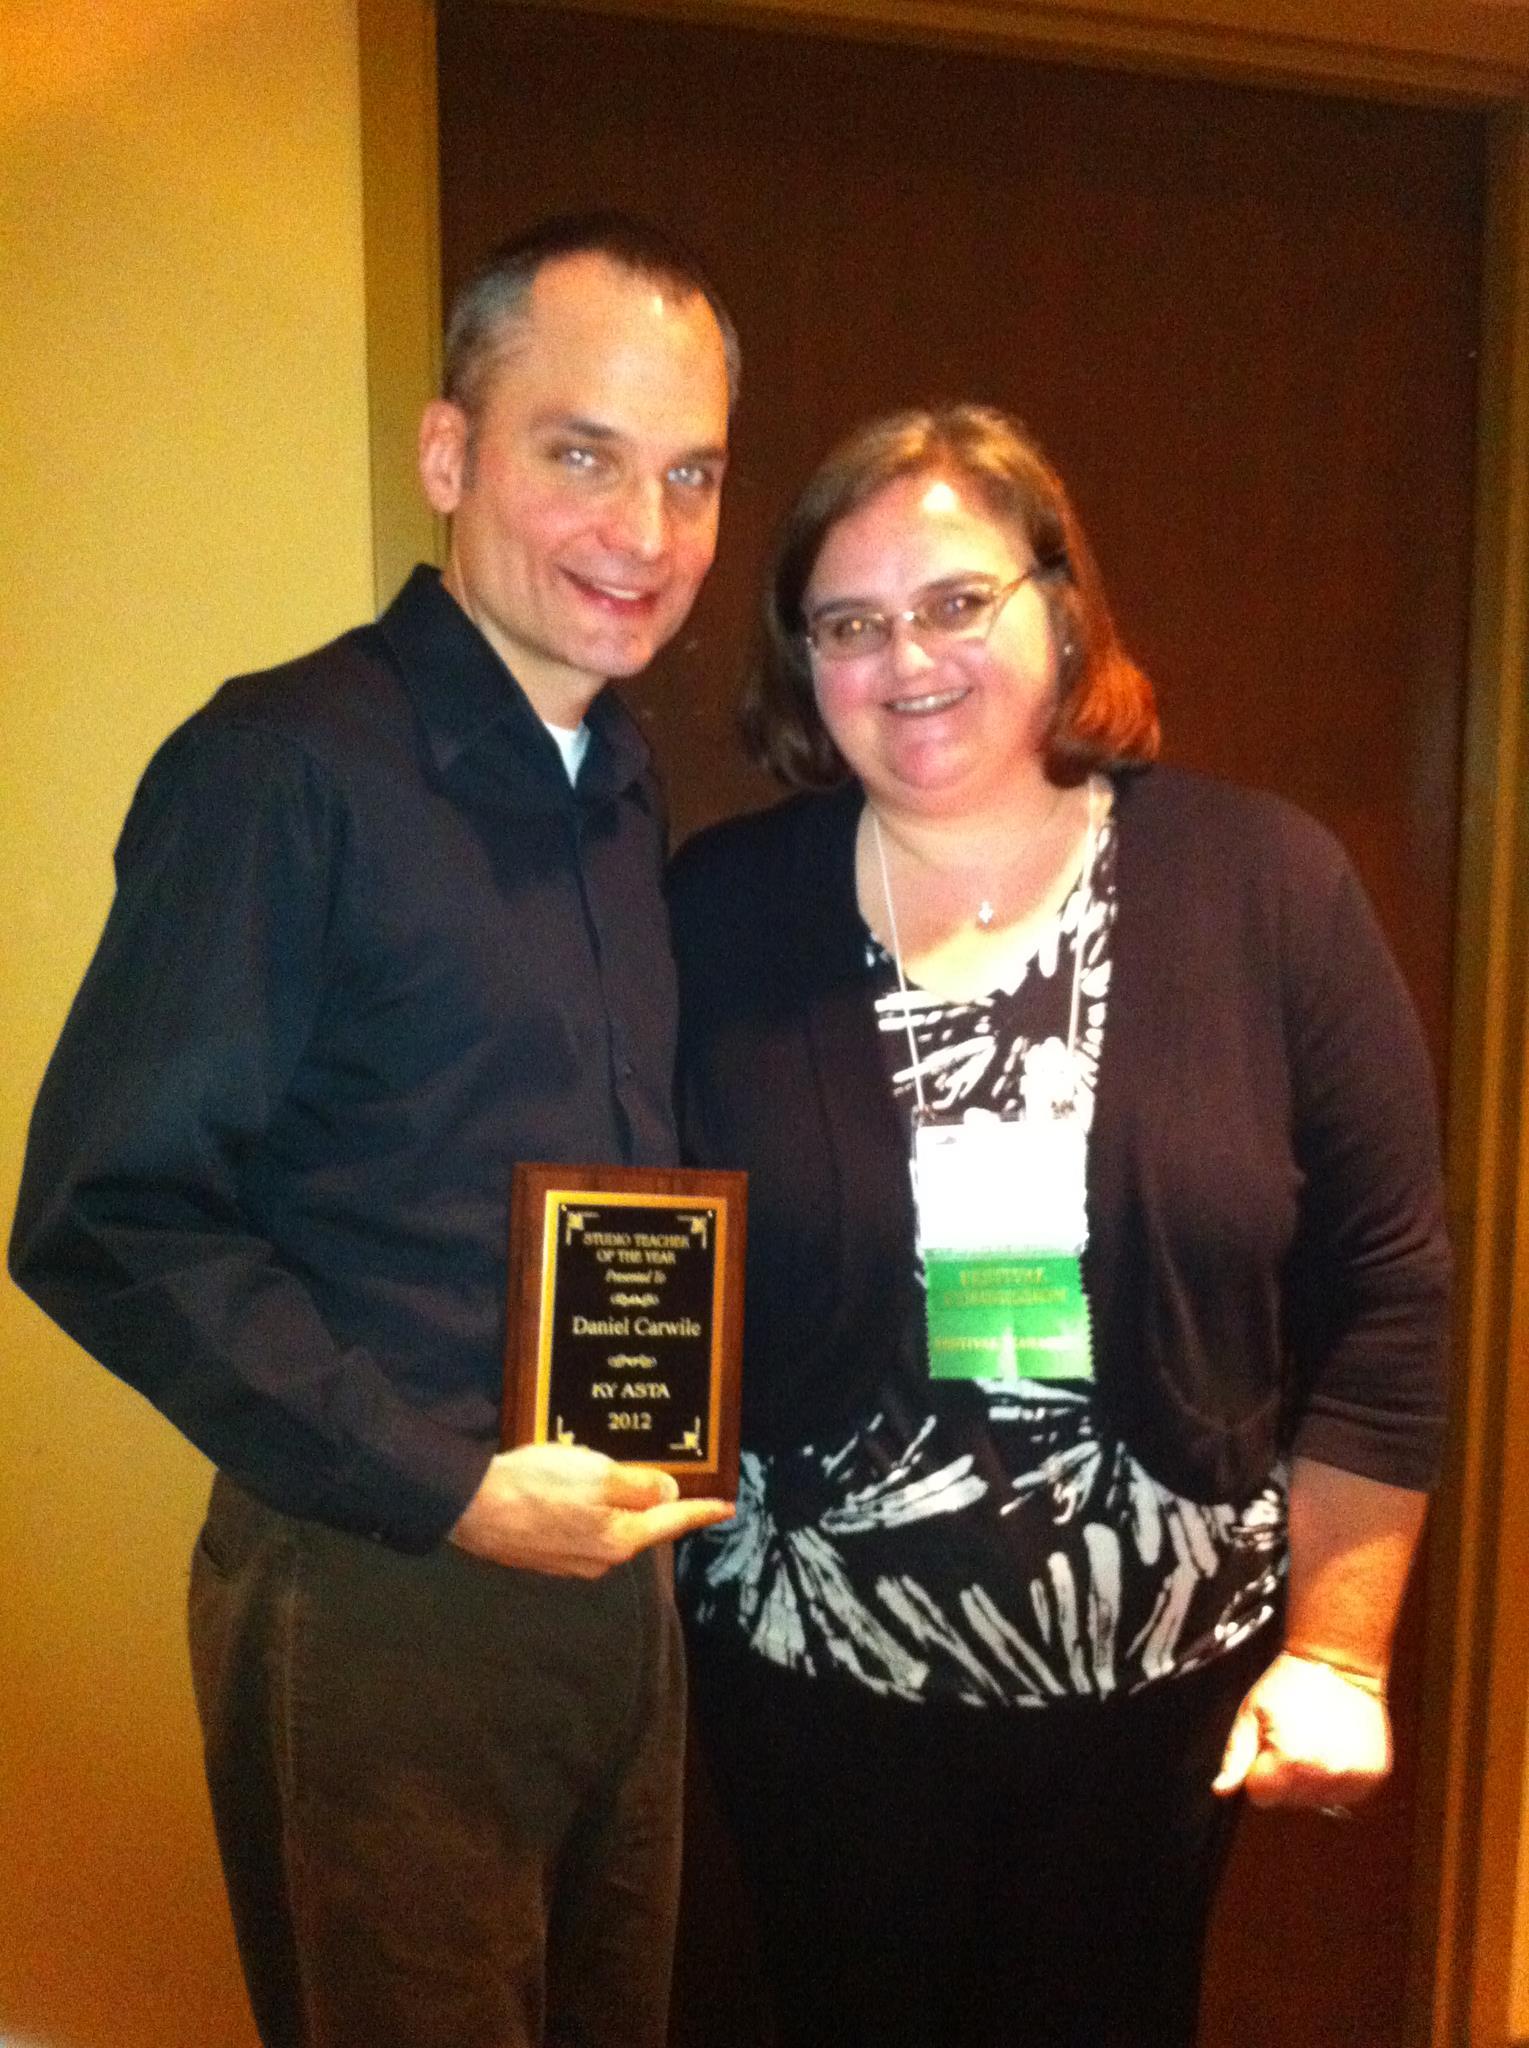 Daniel - Kentucky Studio Teacher of the Year by the American String Teacher Association